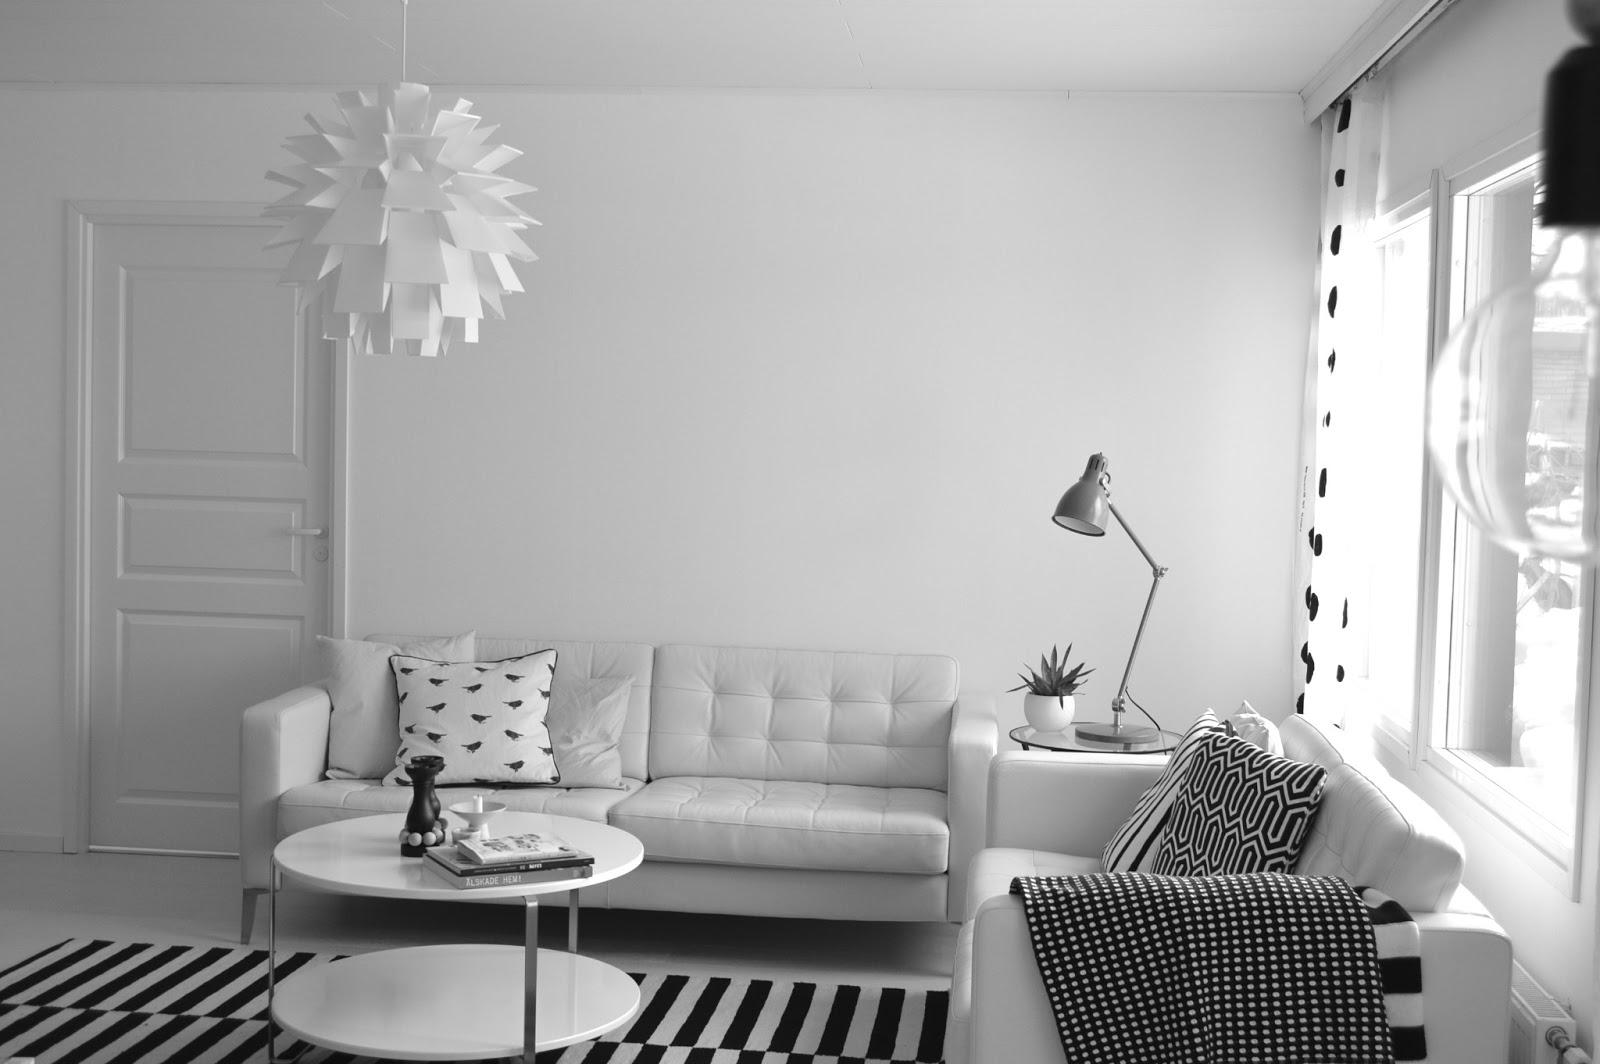 pisaroita norm 69. Black Bedroom Furniture Sets. Home Design Ideas